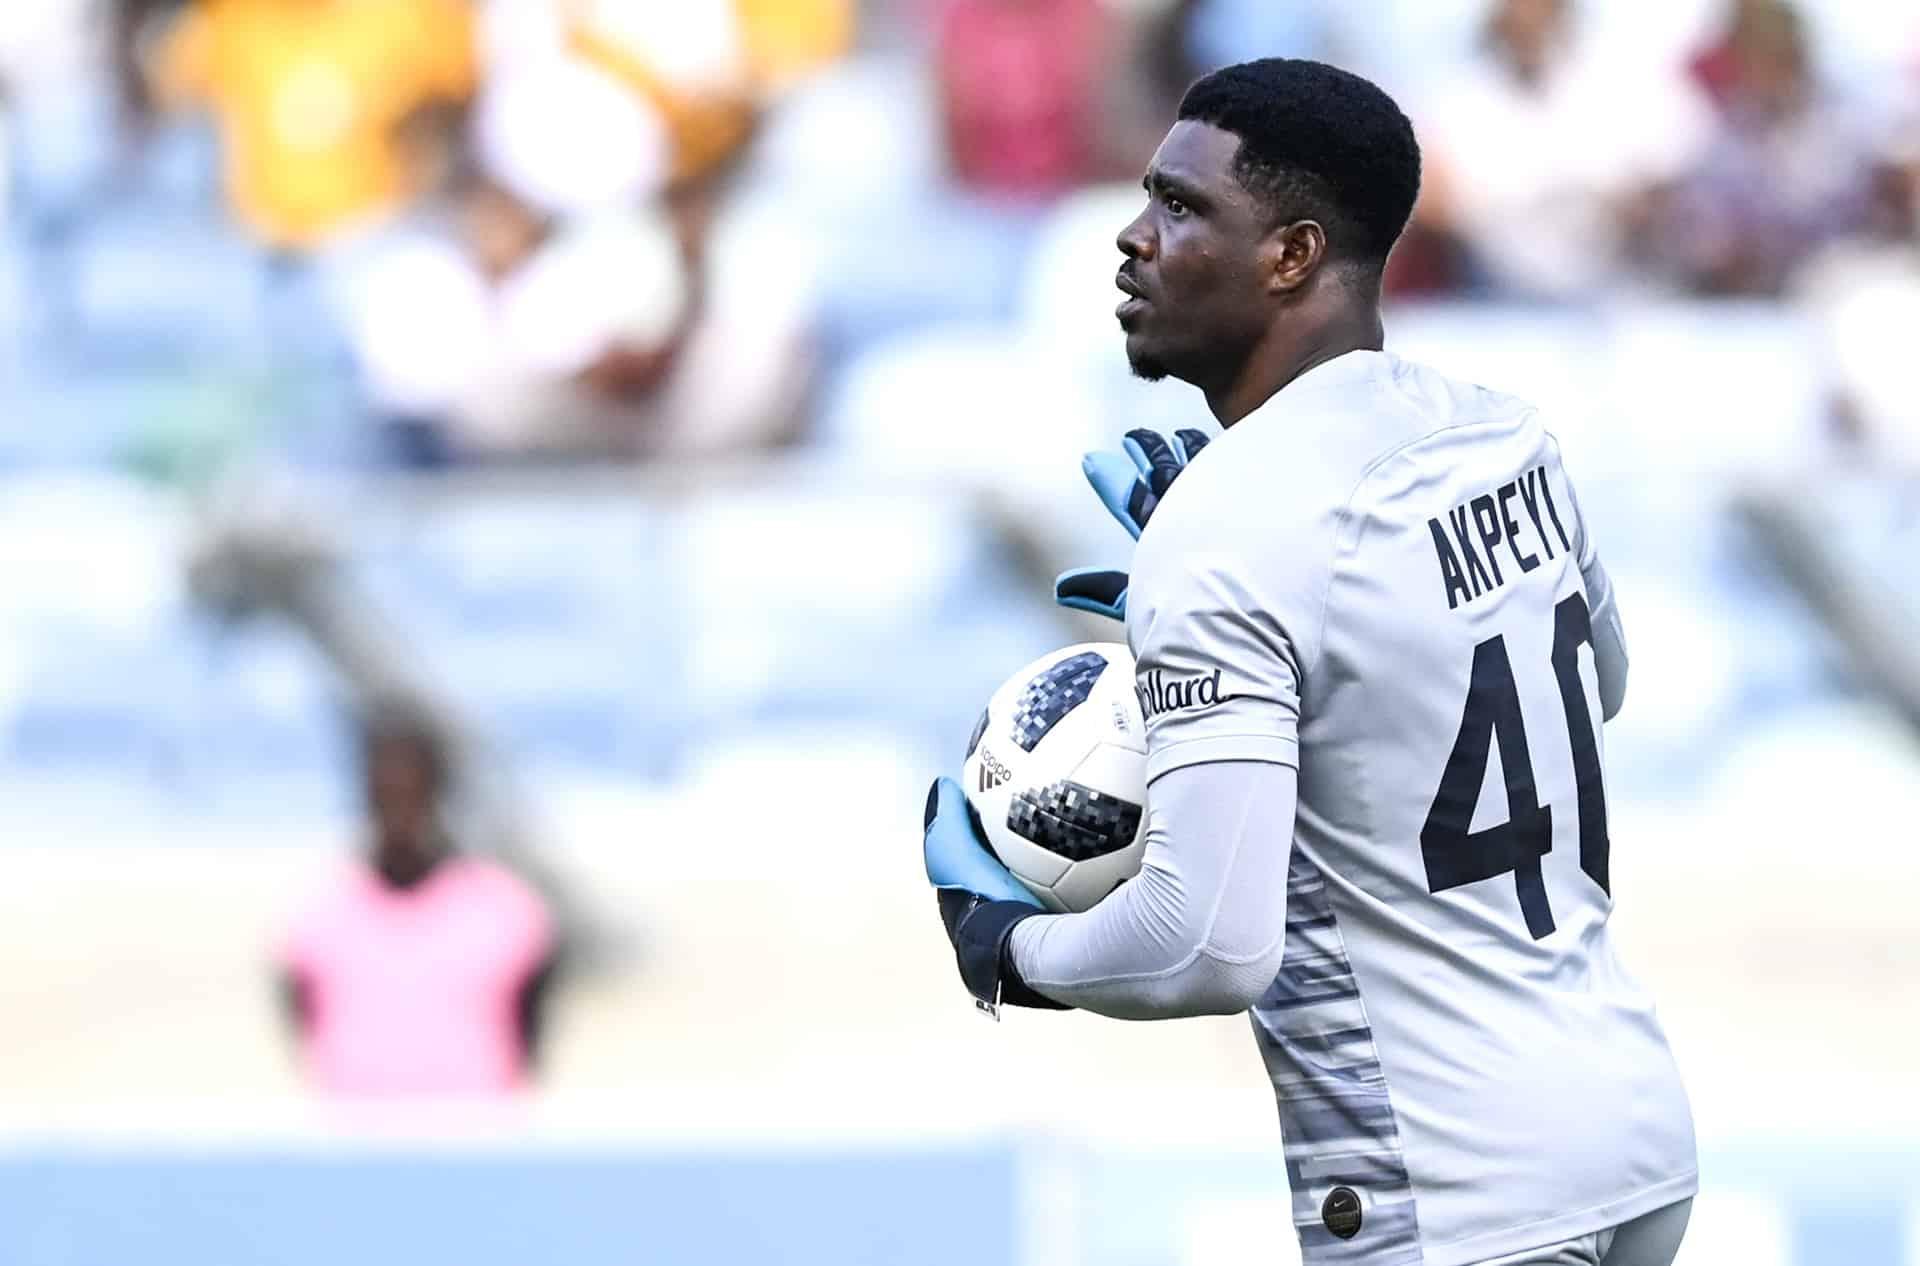 9d207c42 nedbank cup kaizer chiefs daniel akpeyi - Akpeyi should not try to play like Khune – Etafia